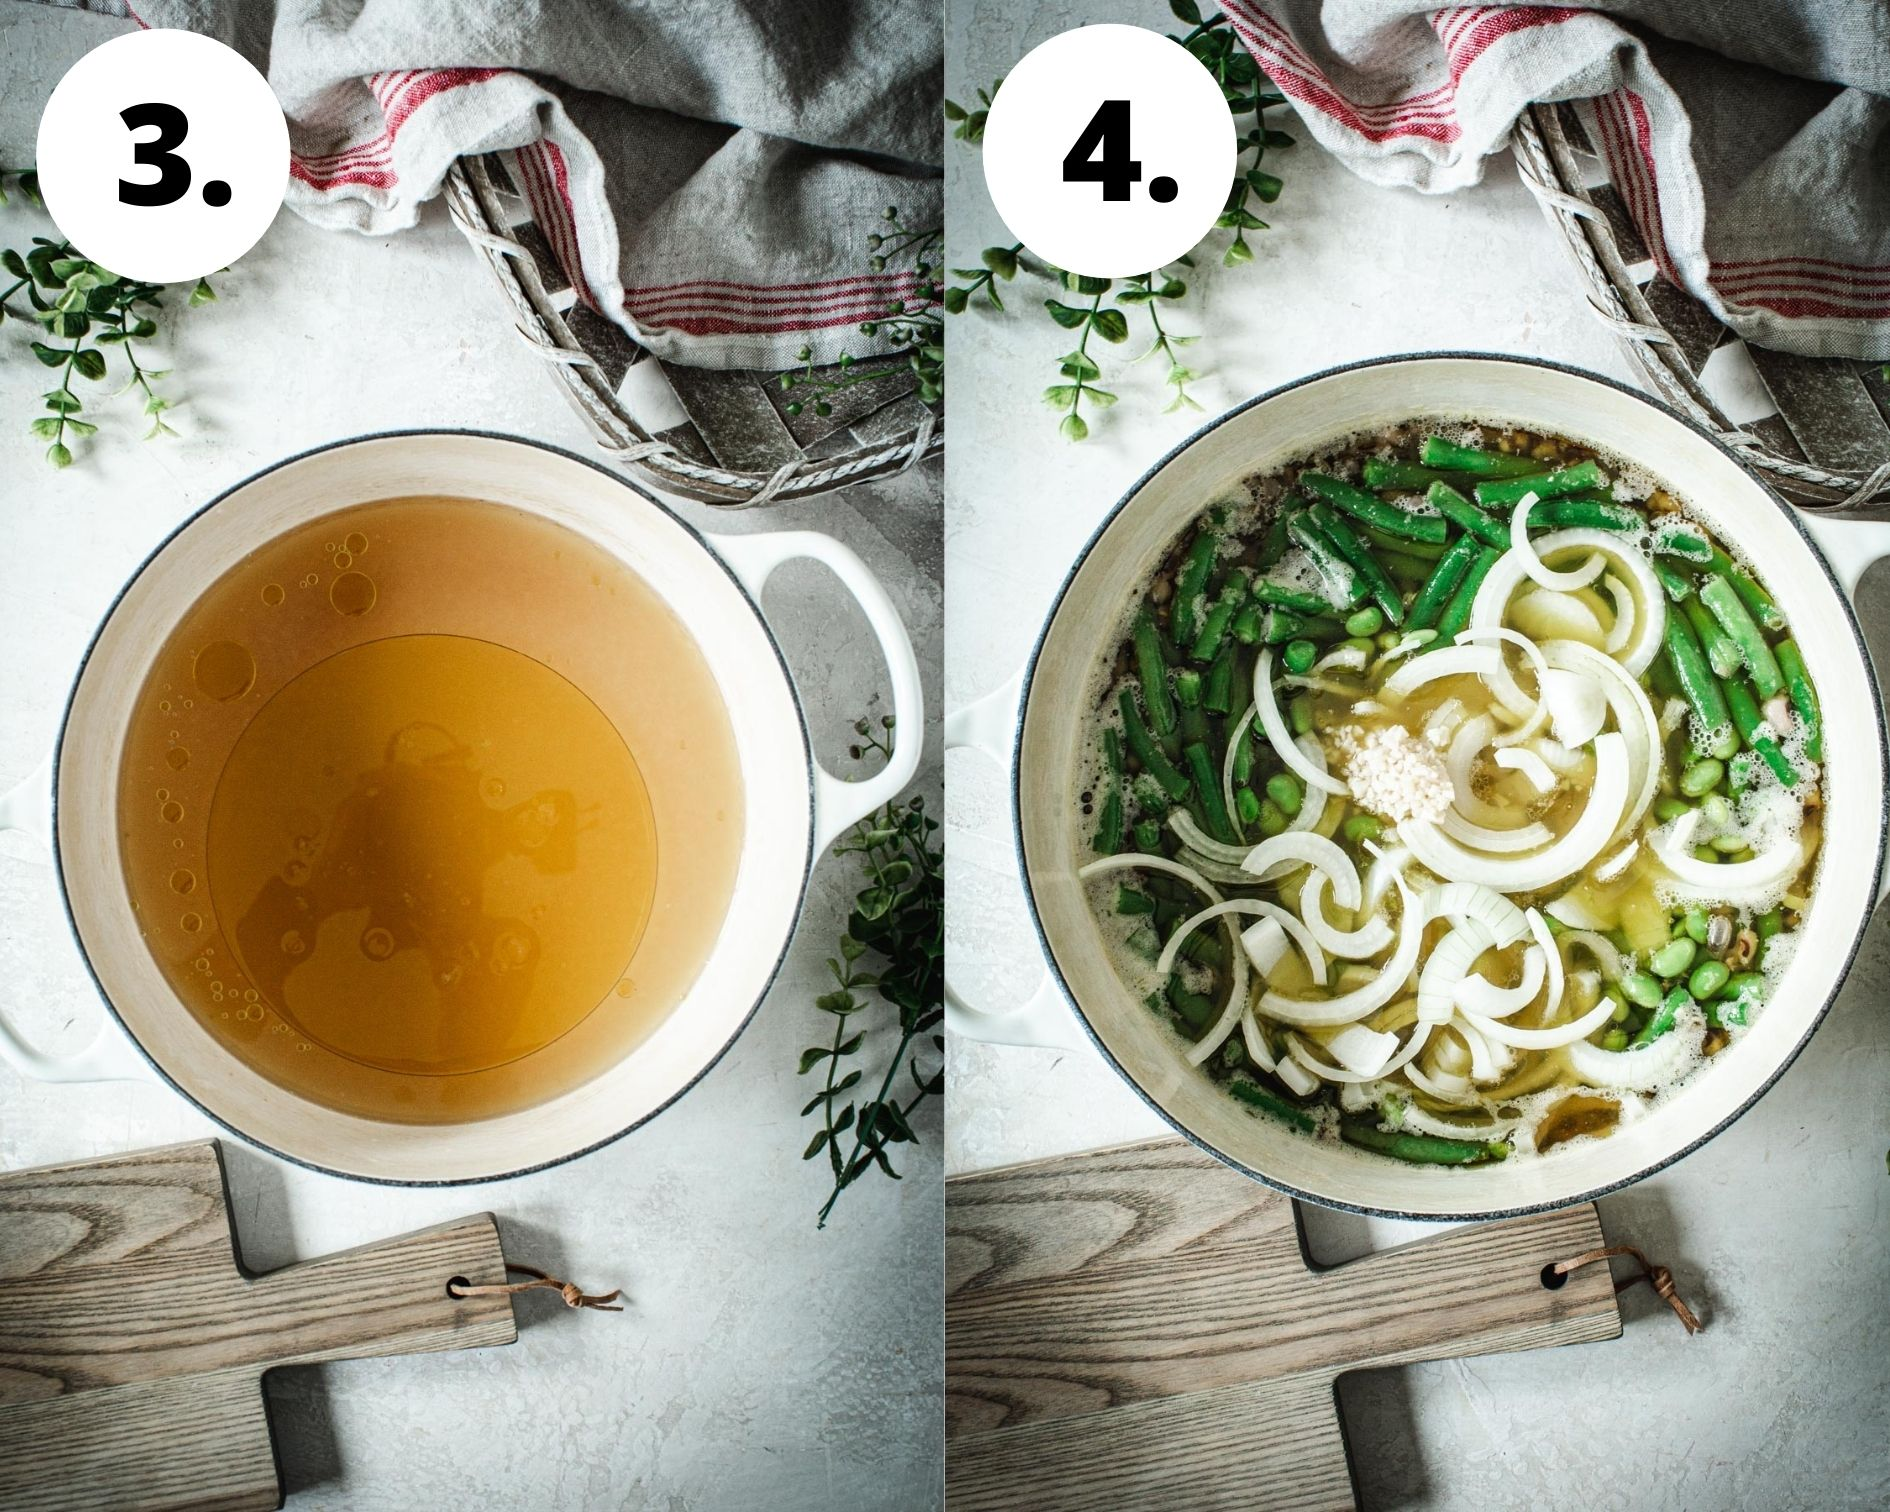 Three bean salad process steps 3 and 4.